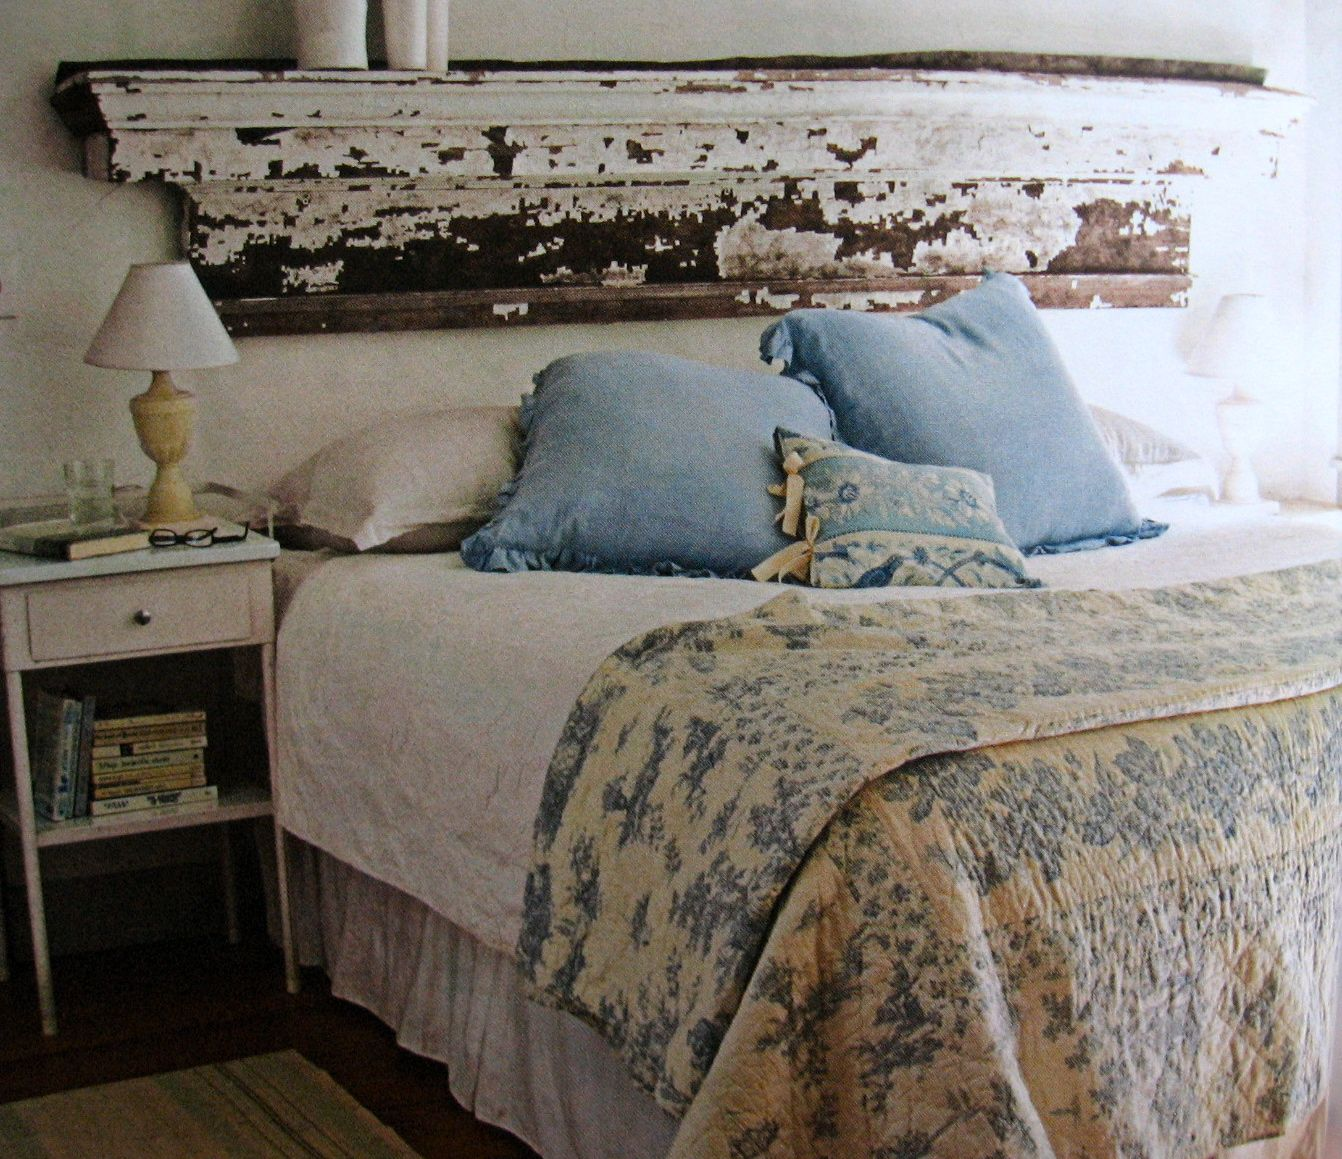 Master bedroom shelves above the bed  Flea Market Style  Bedroom Beauties  Pinterest  Flea market style